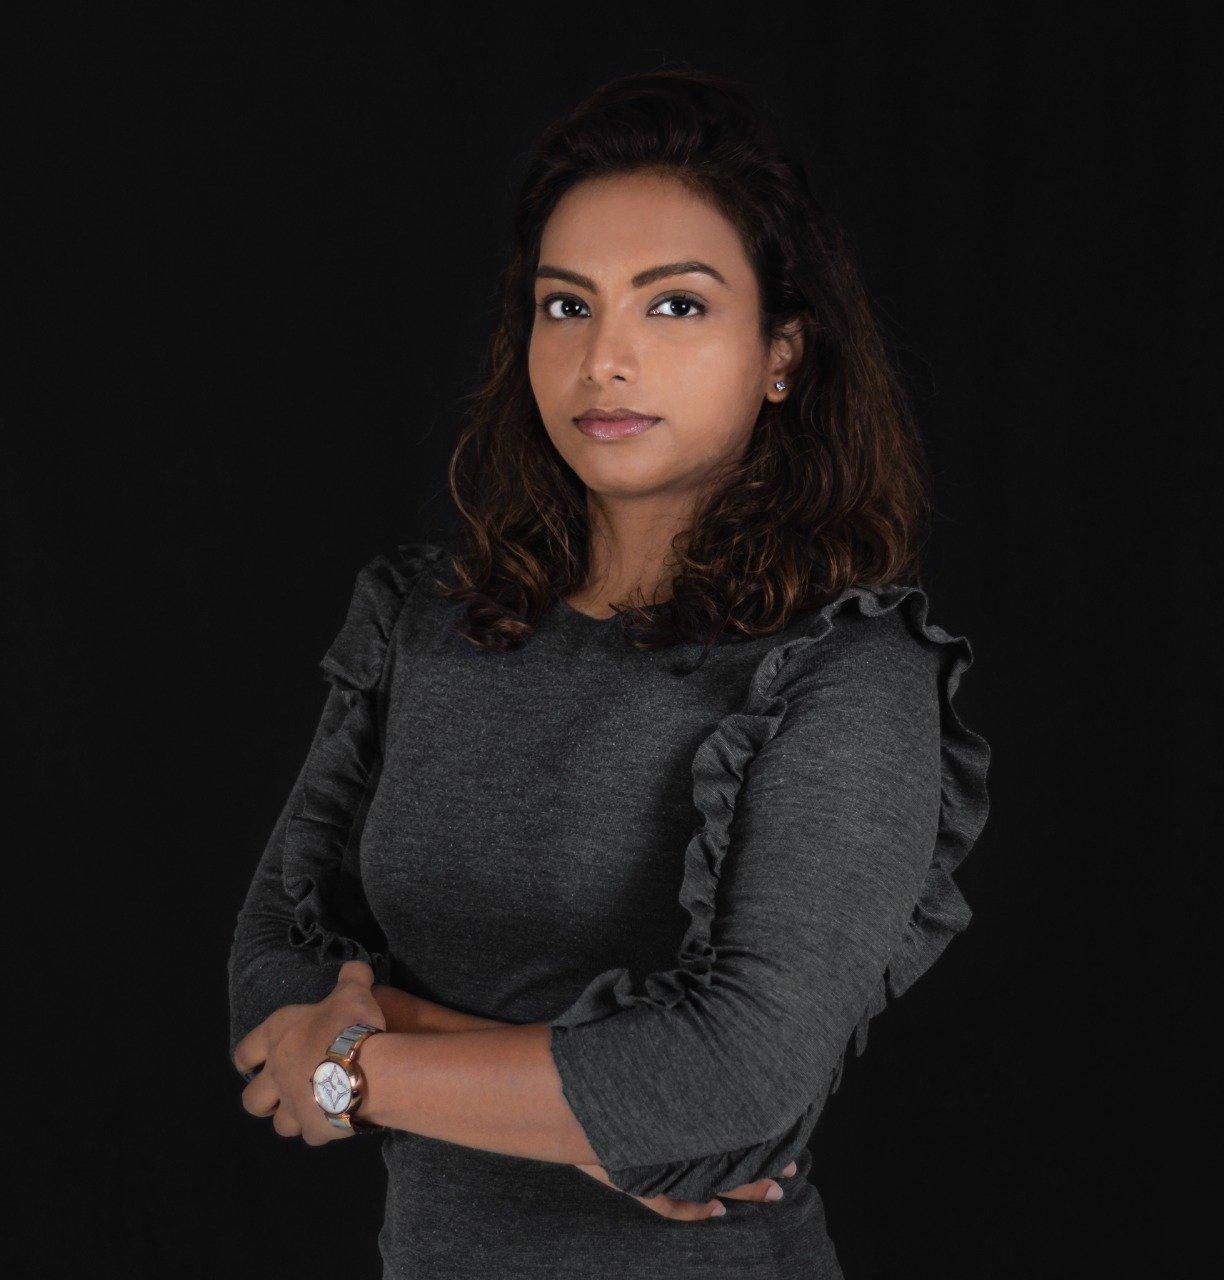 The speaker Shanthi Thangaraj,'s profile image